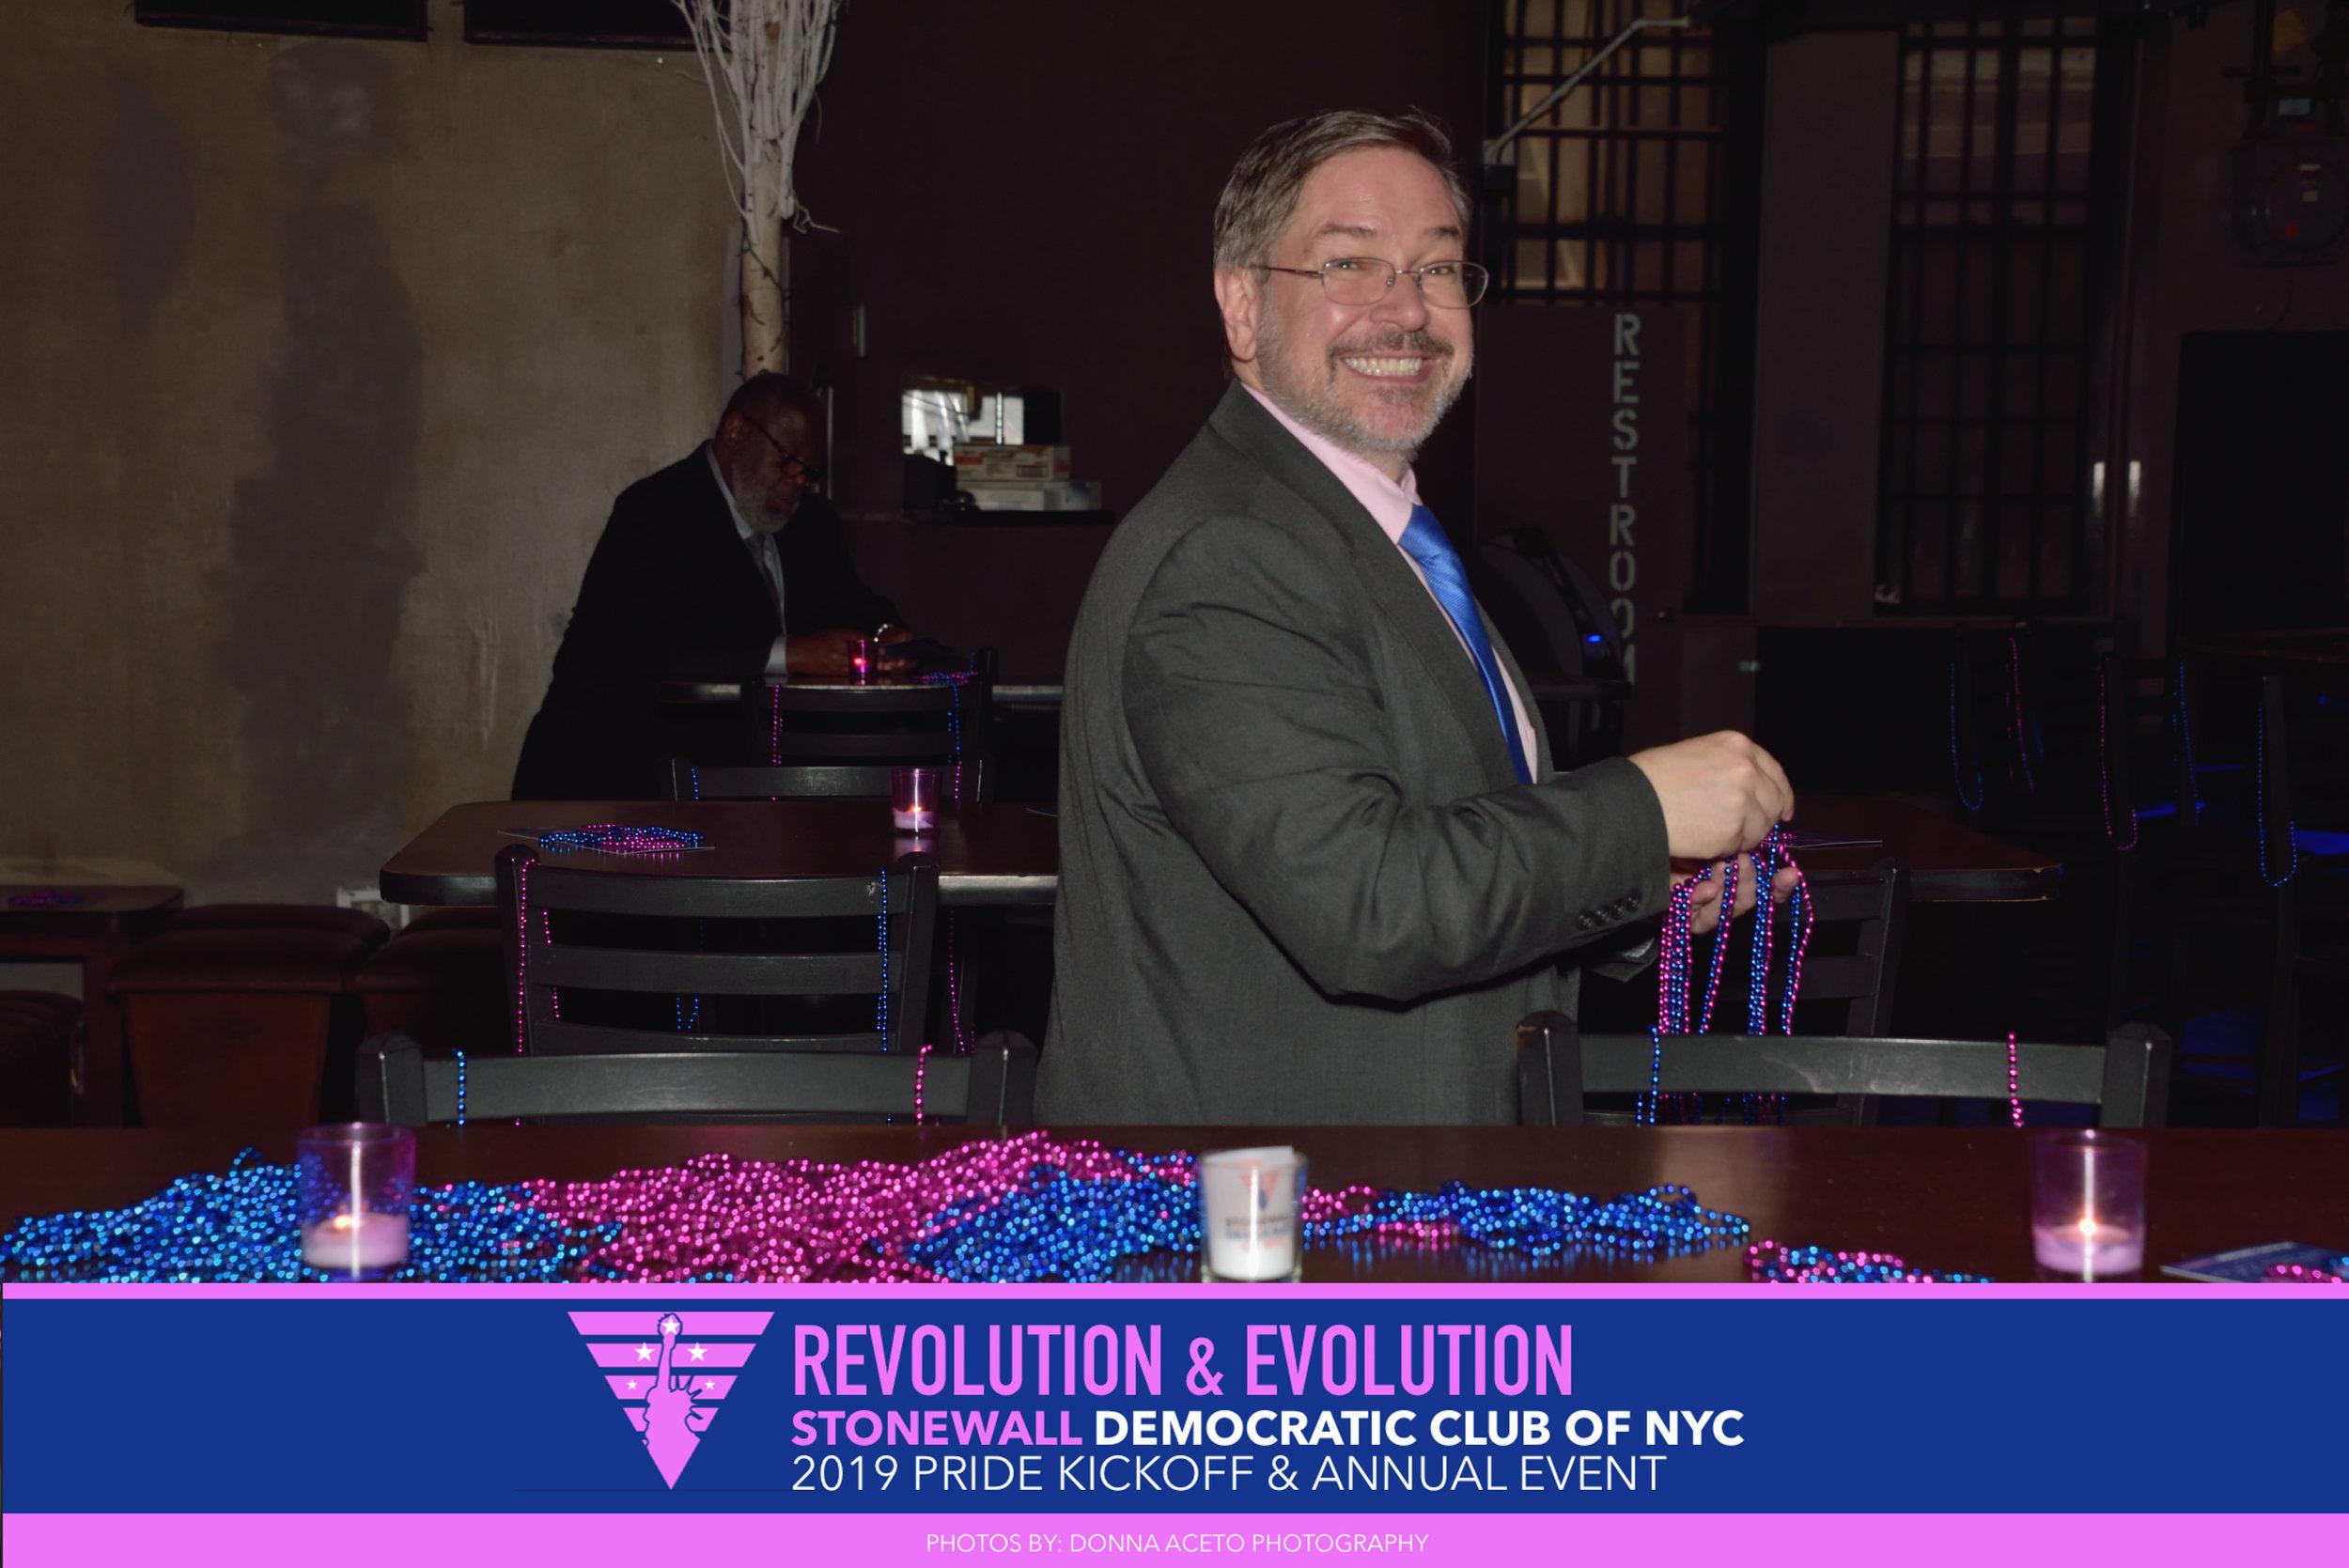 SDNYC 2019 ANNUAL EVENT1.jpg